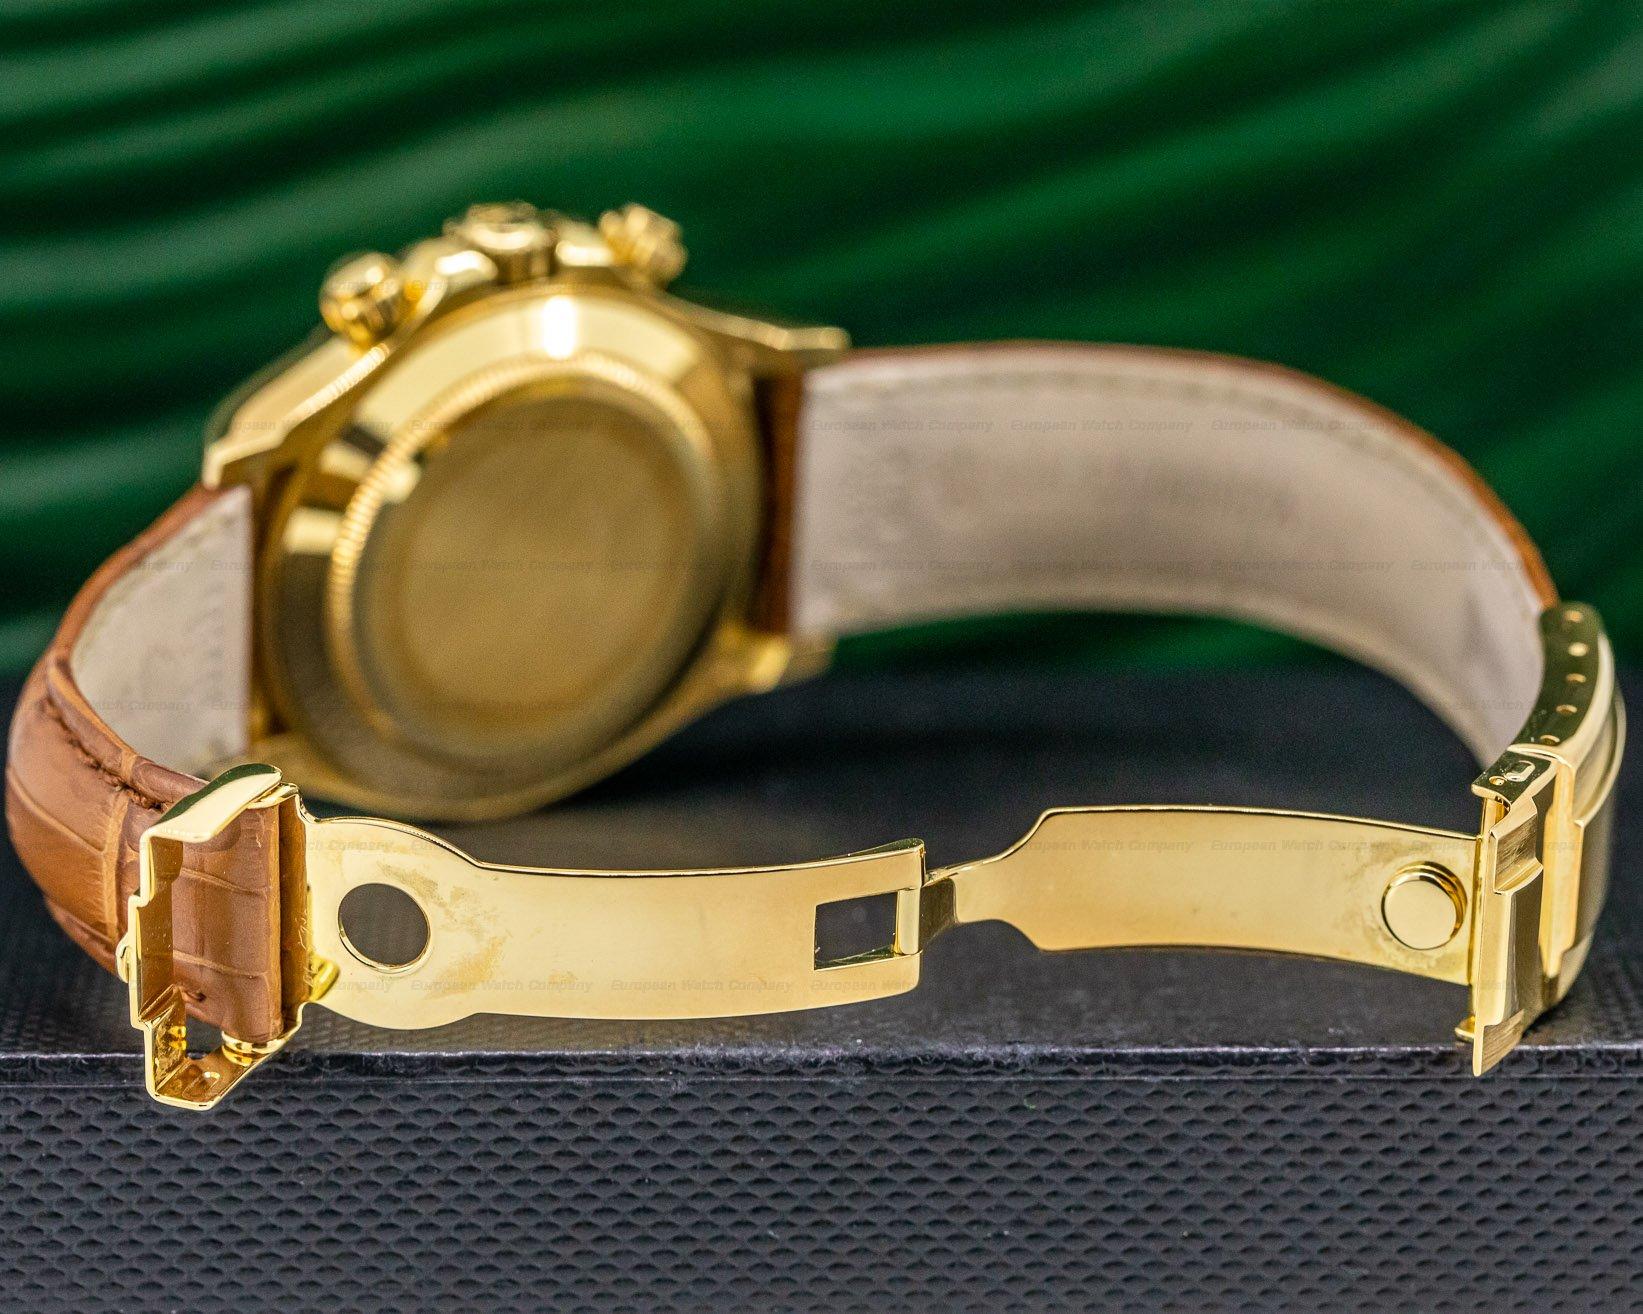 Rolex 116518 Daytona 18K Yellow Gold / Black MOP Dial